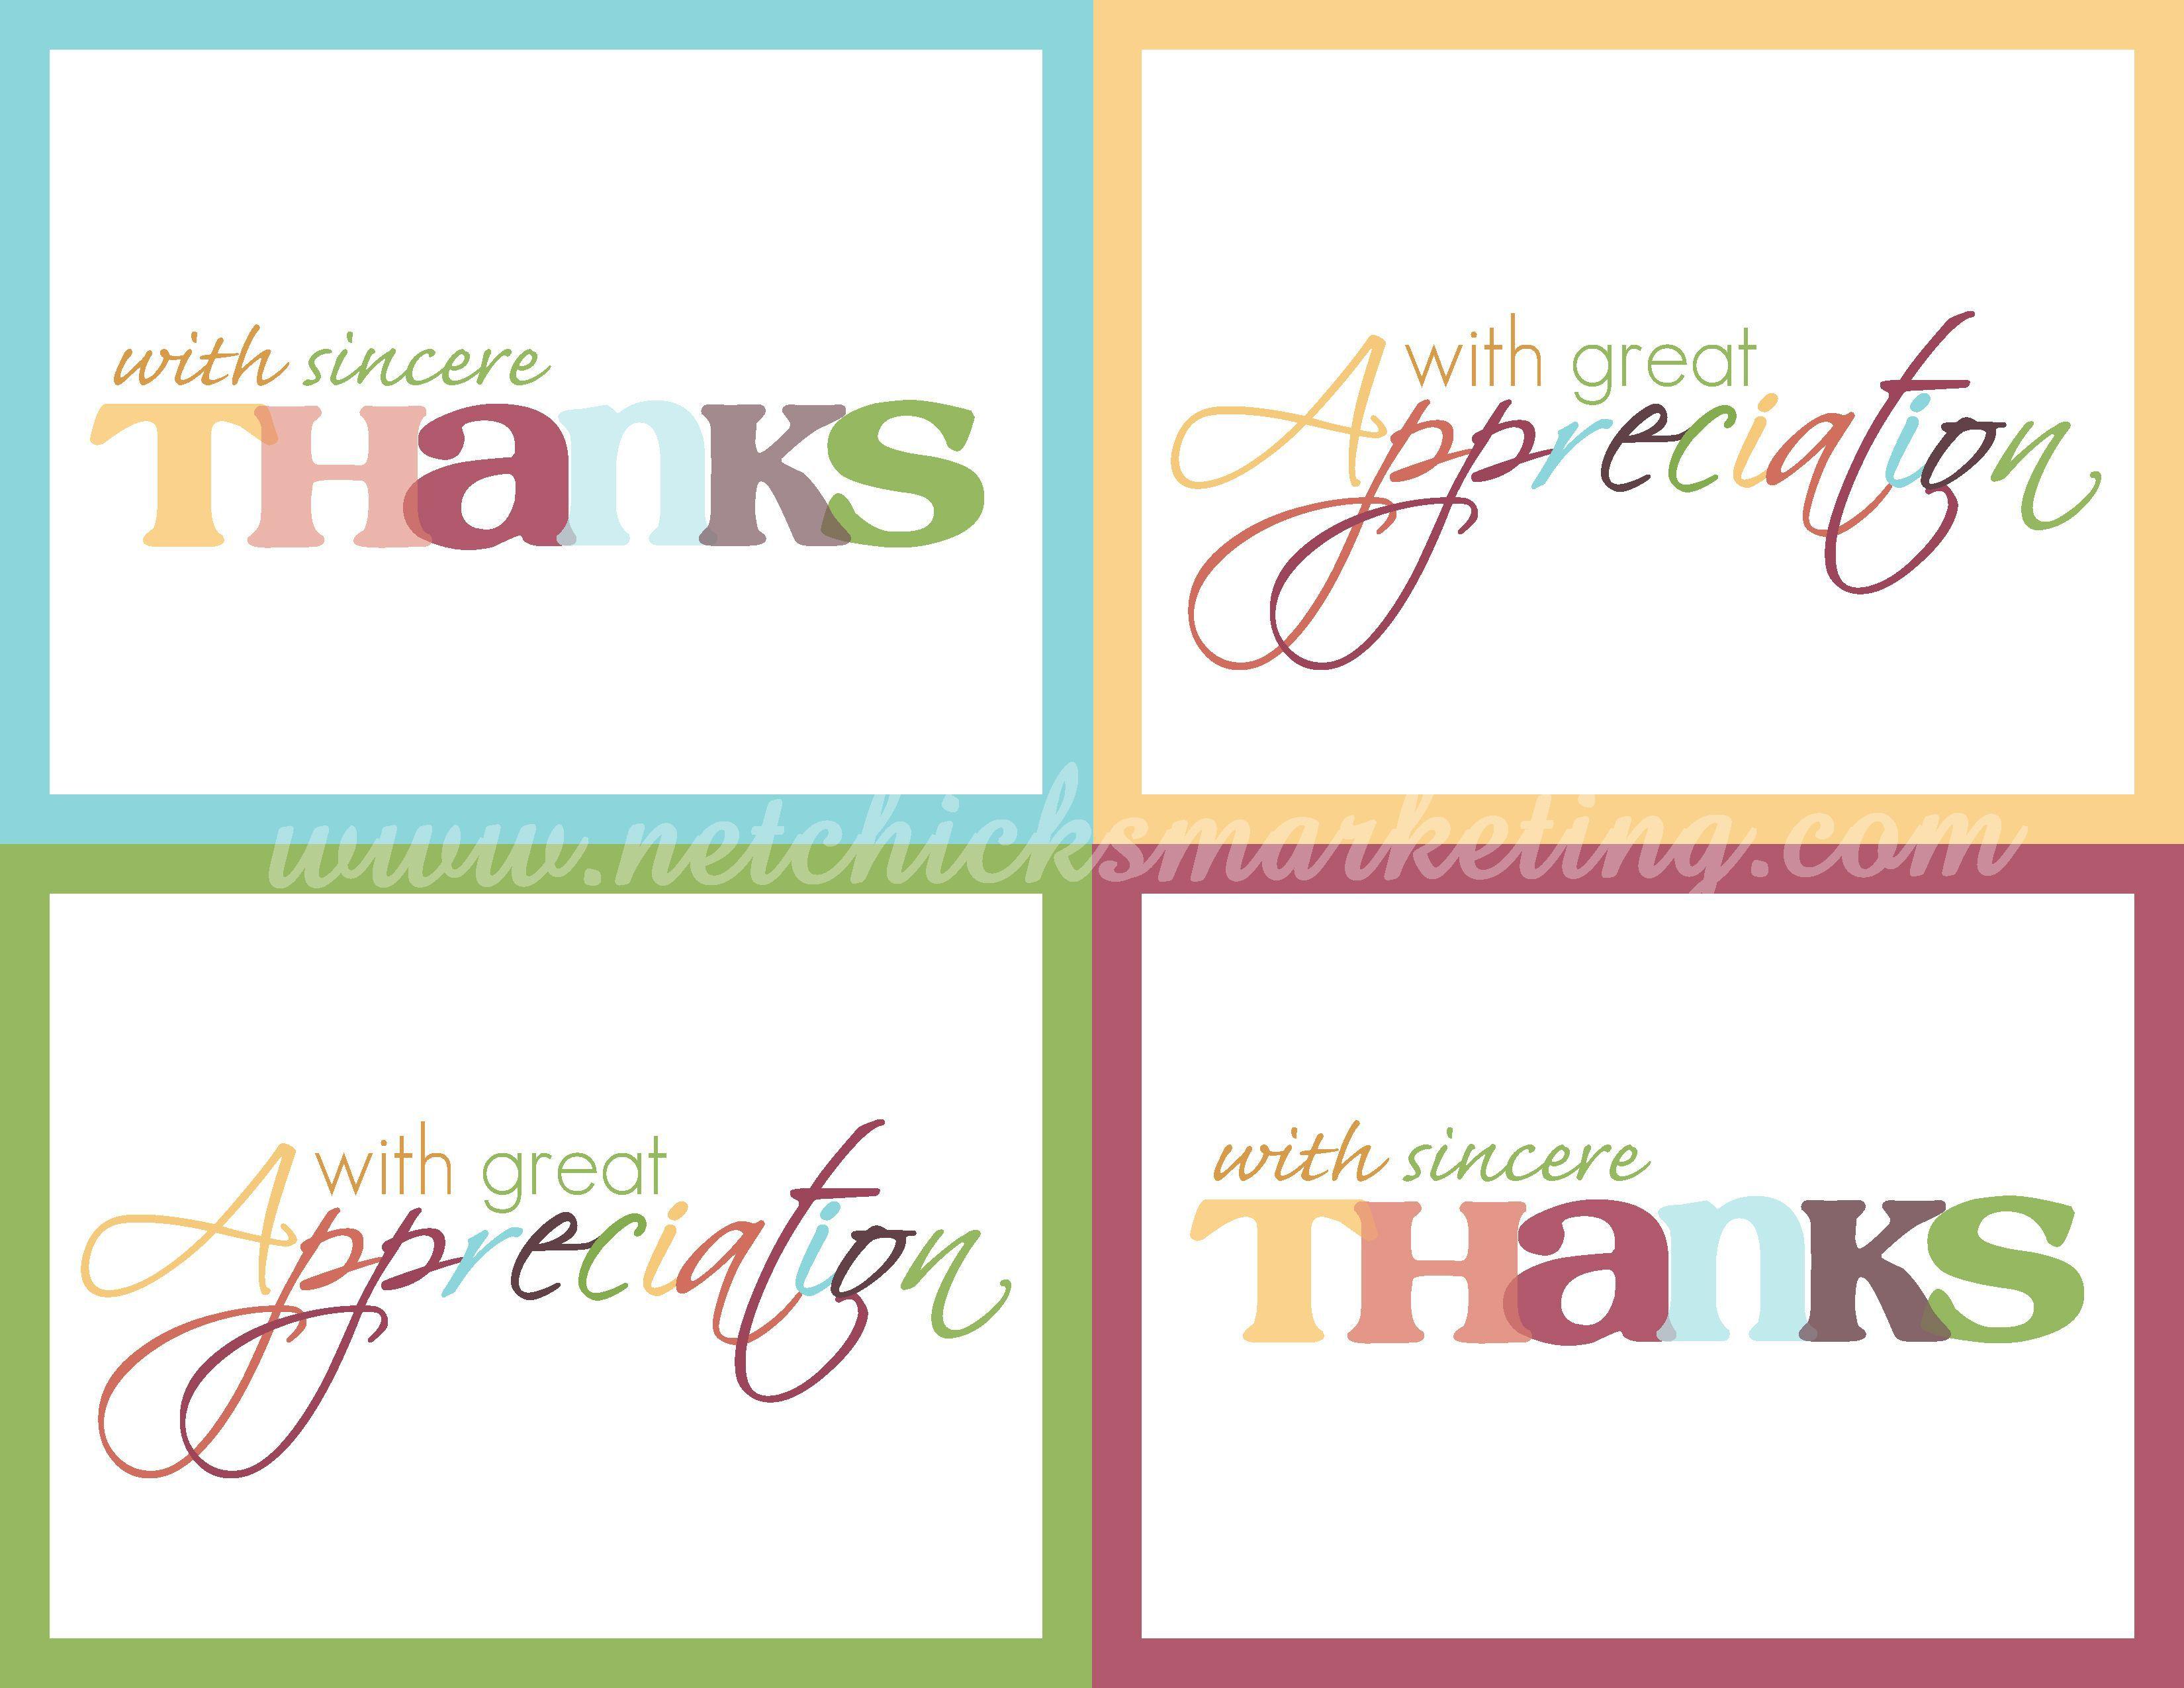 003 Wondrou Free Printable Photo Card Template Image  Templates Birthday Thank YouFull